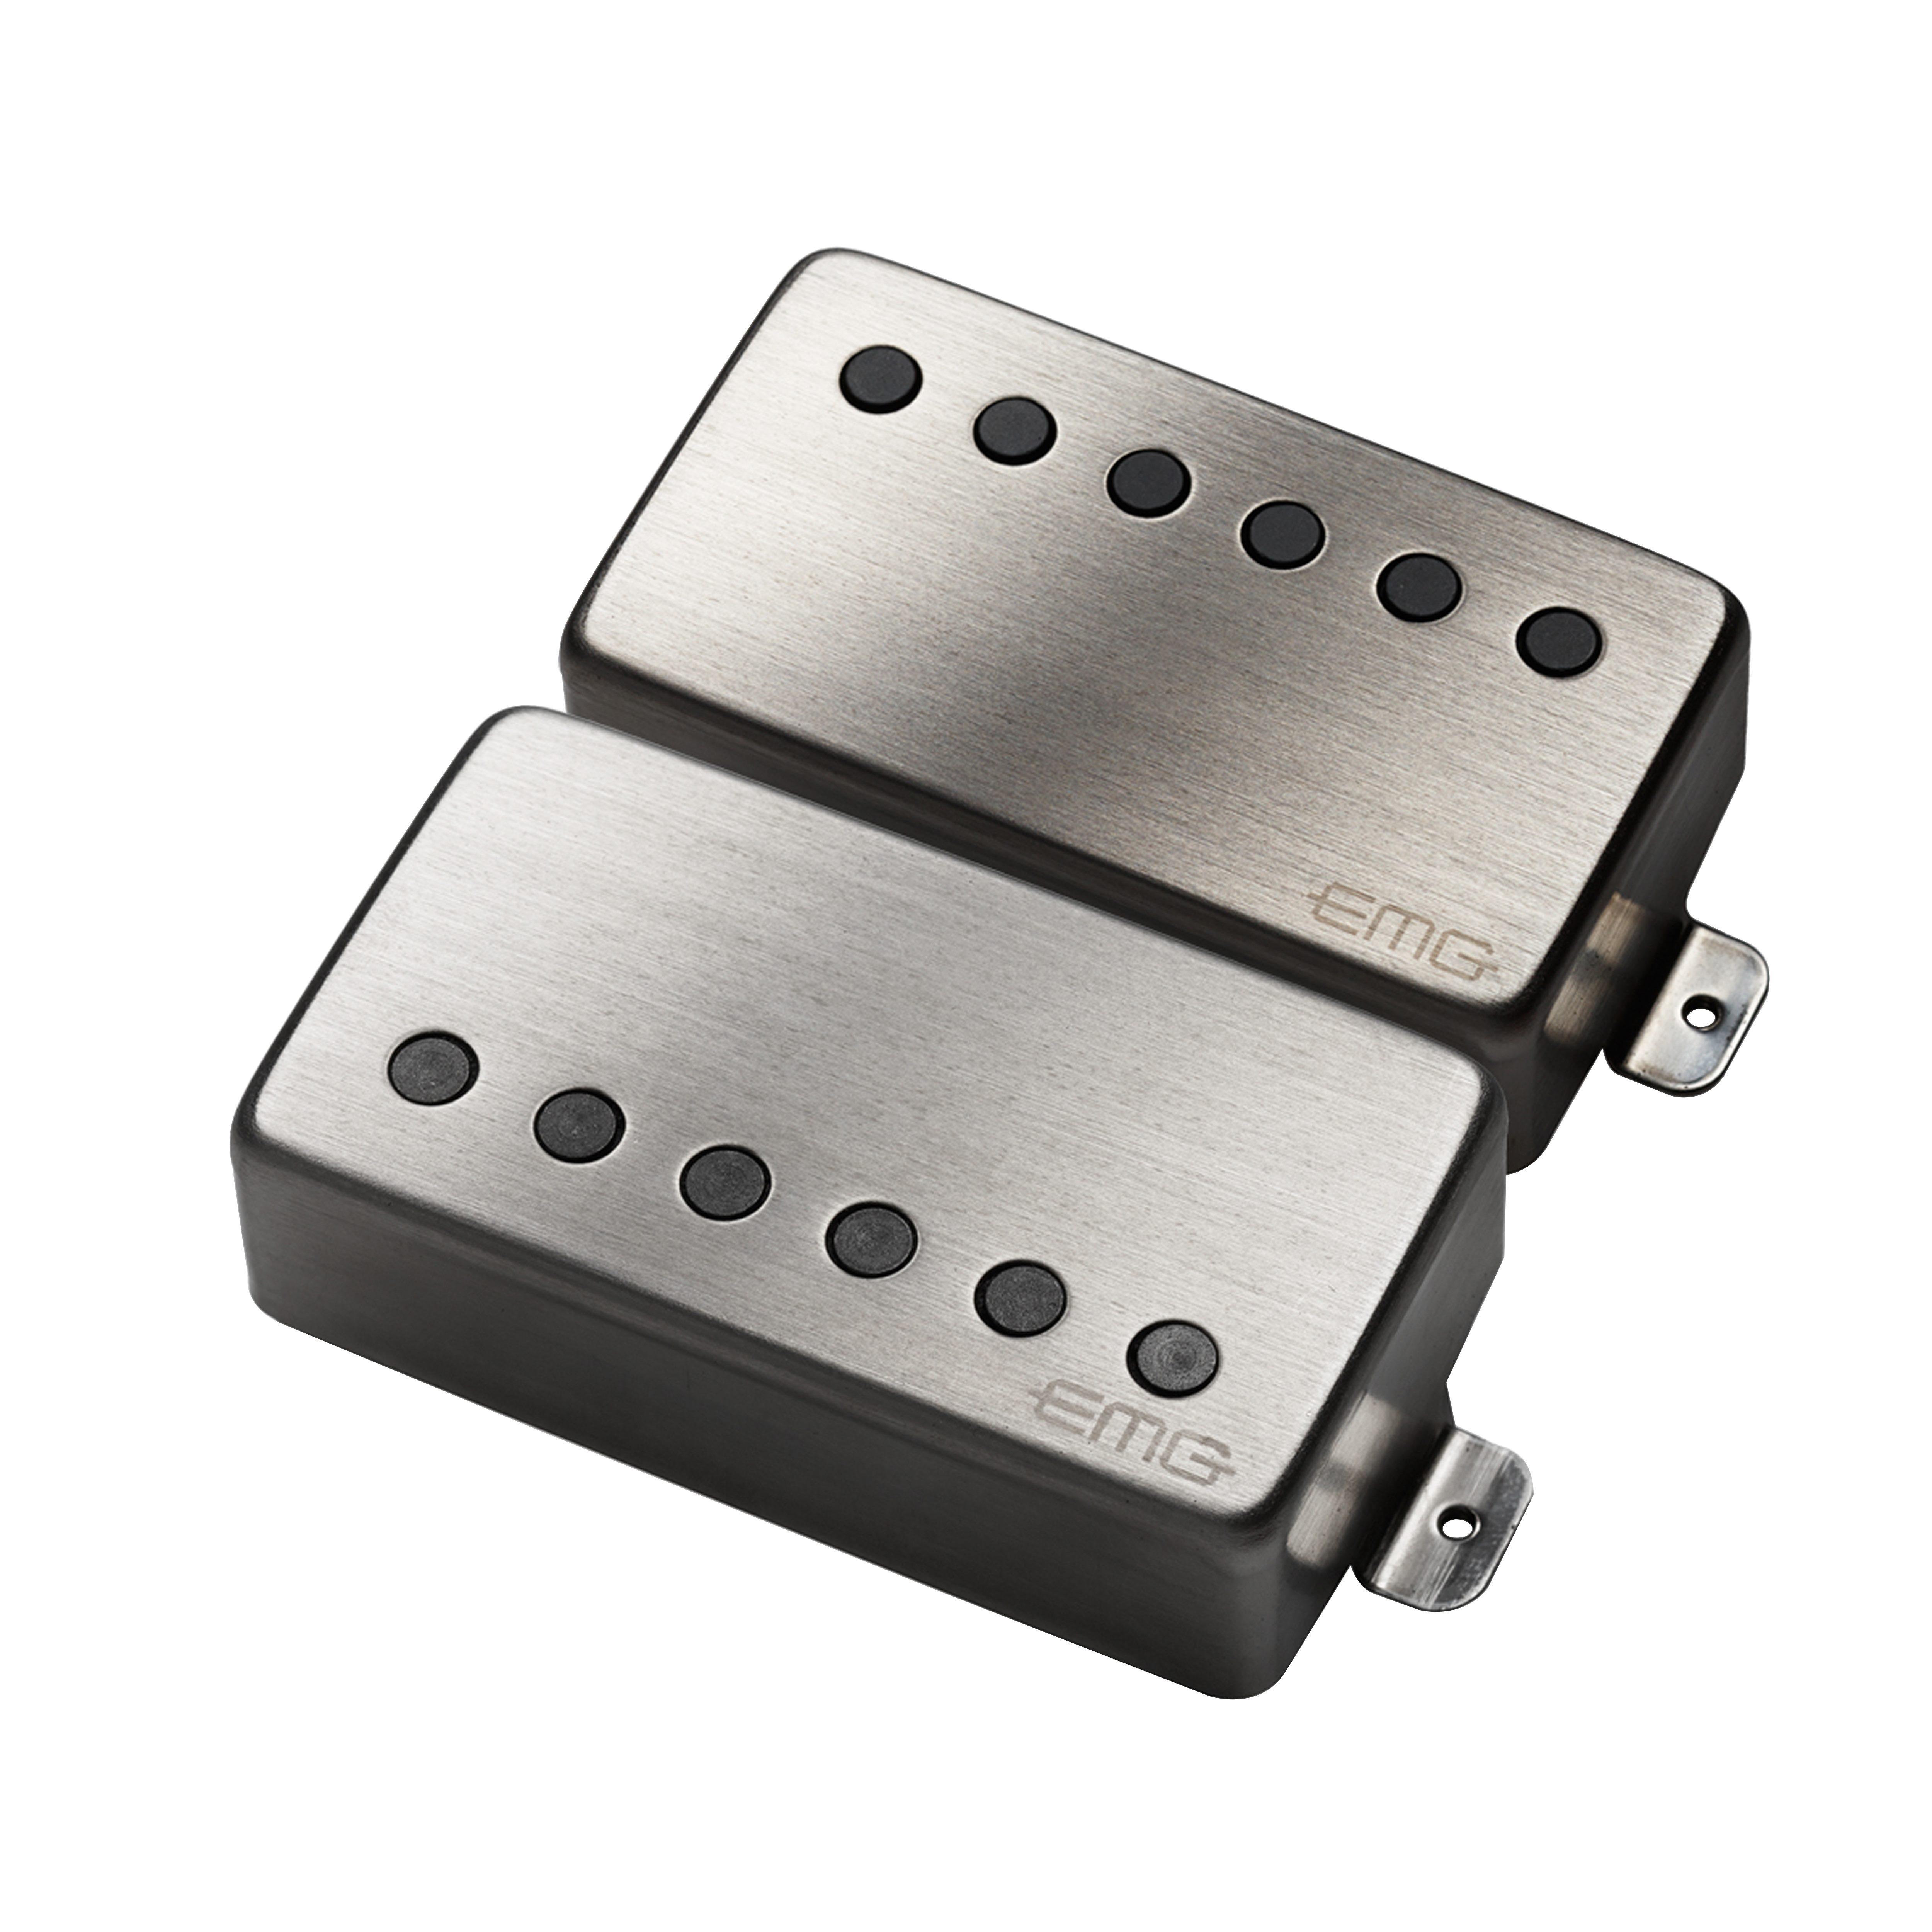 emg jh james hetfield electric guitar pickup set, brushed chrome James Hetfield Gear